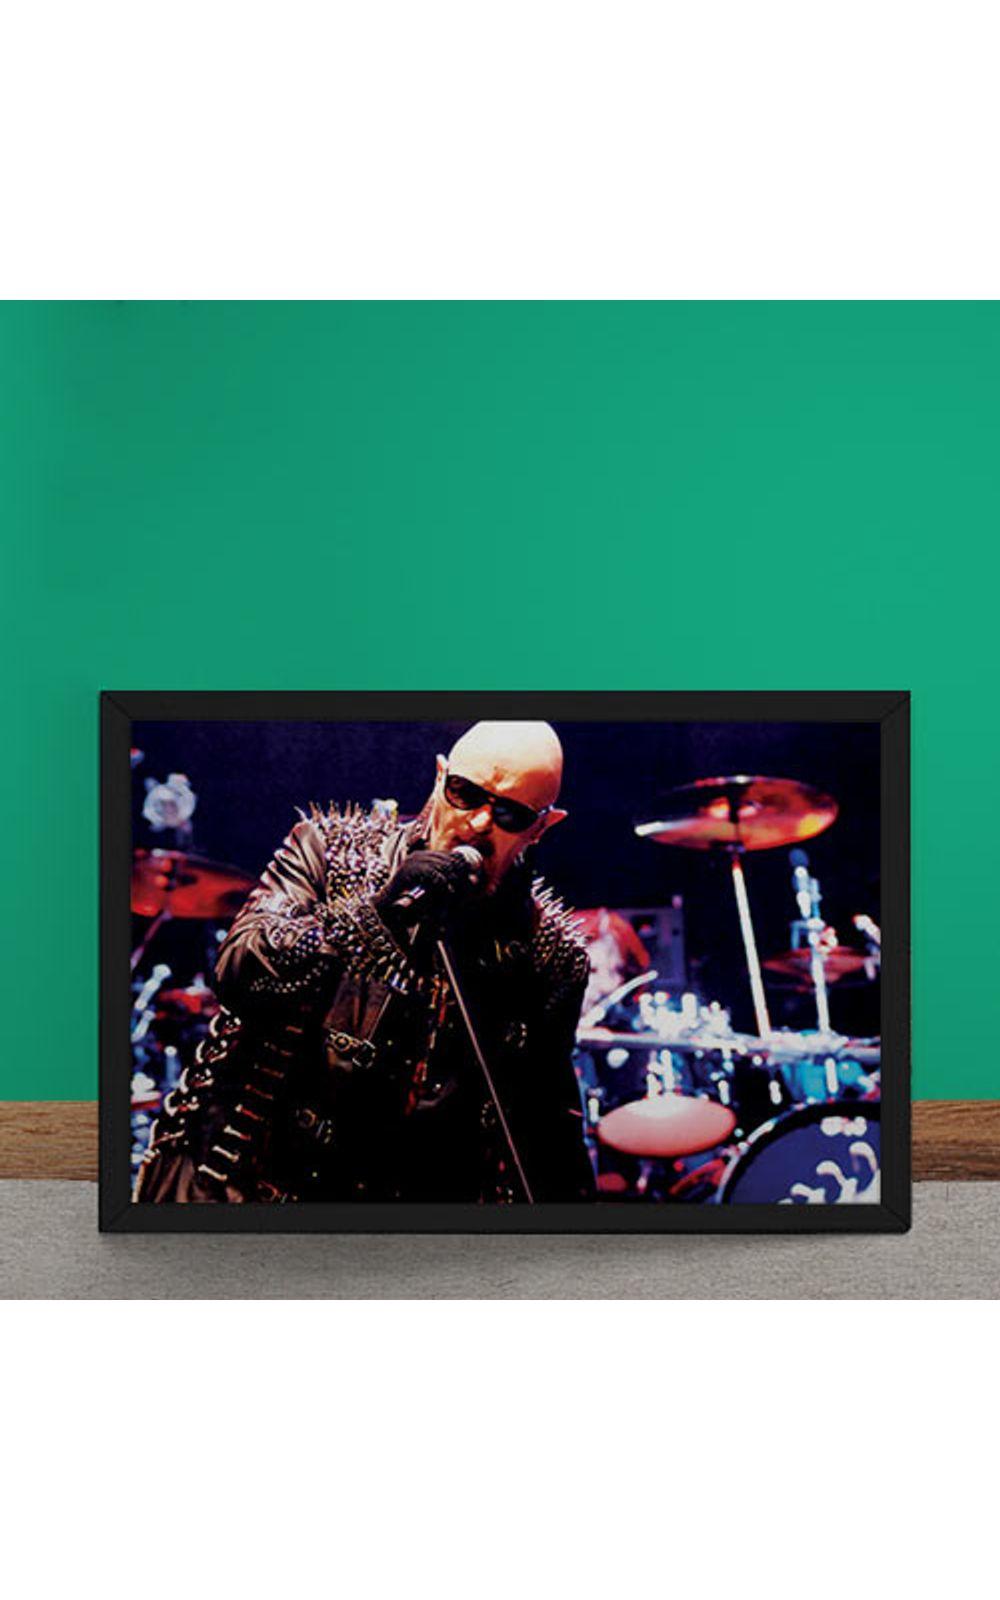 Foto 2 - Quadro Decorativo Judas Priest Rob Halford